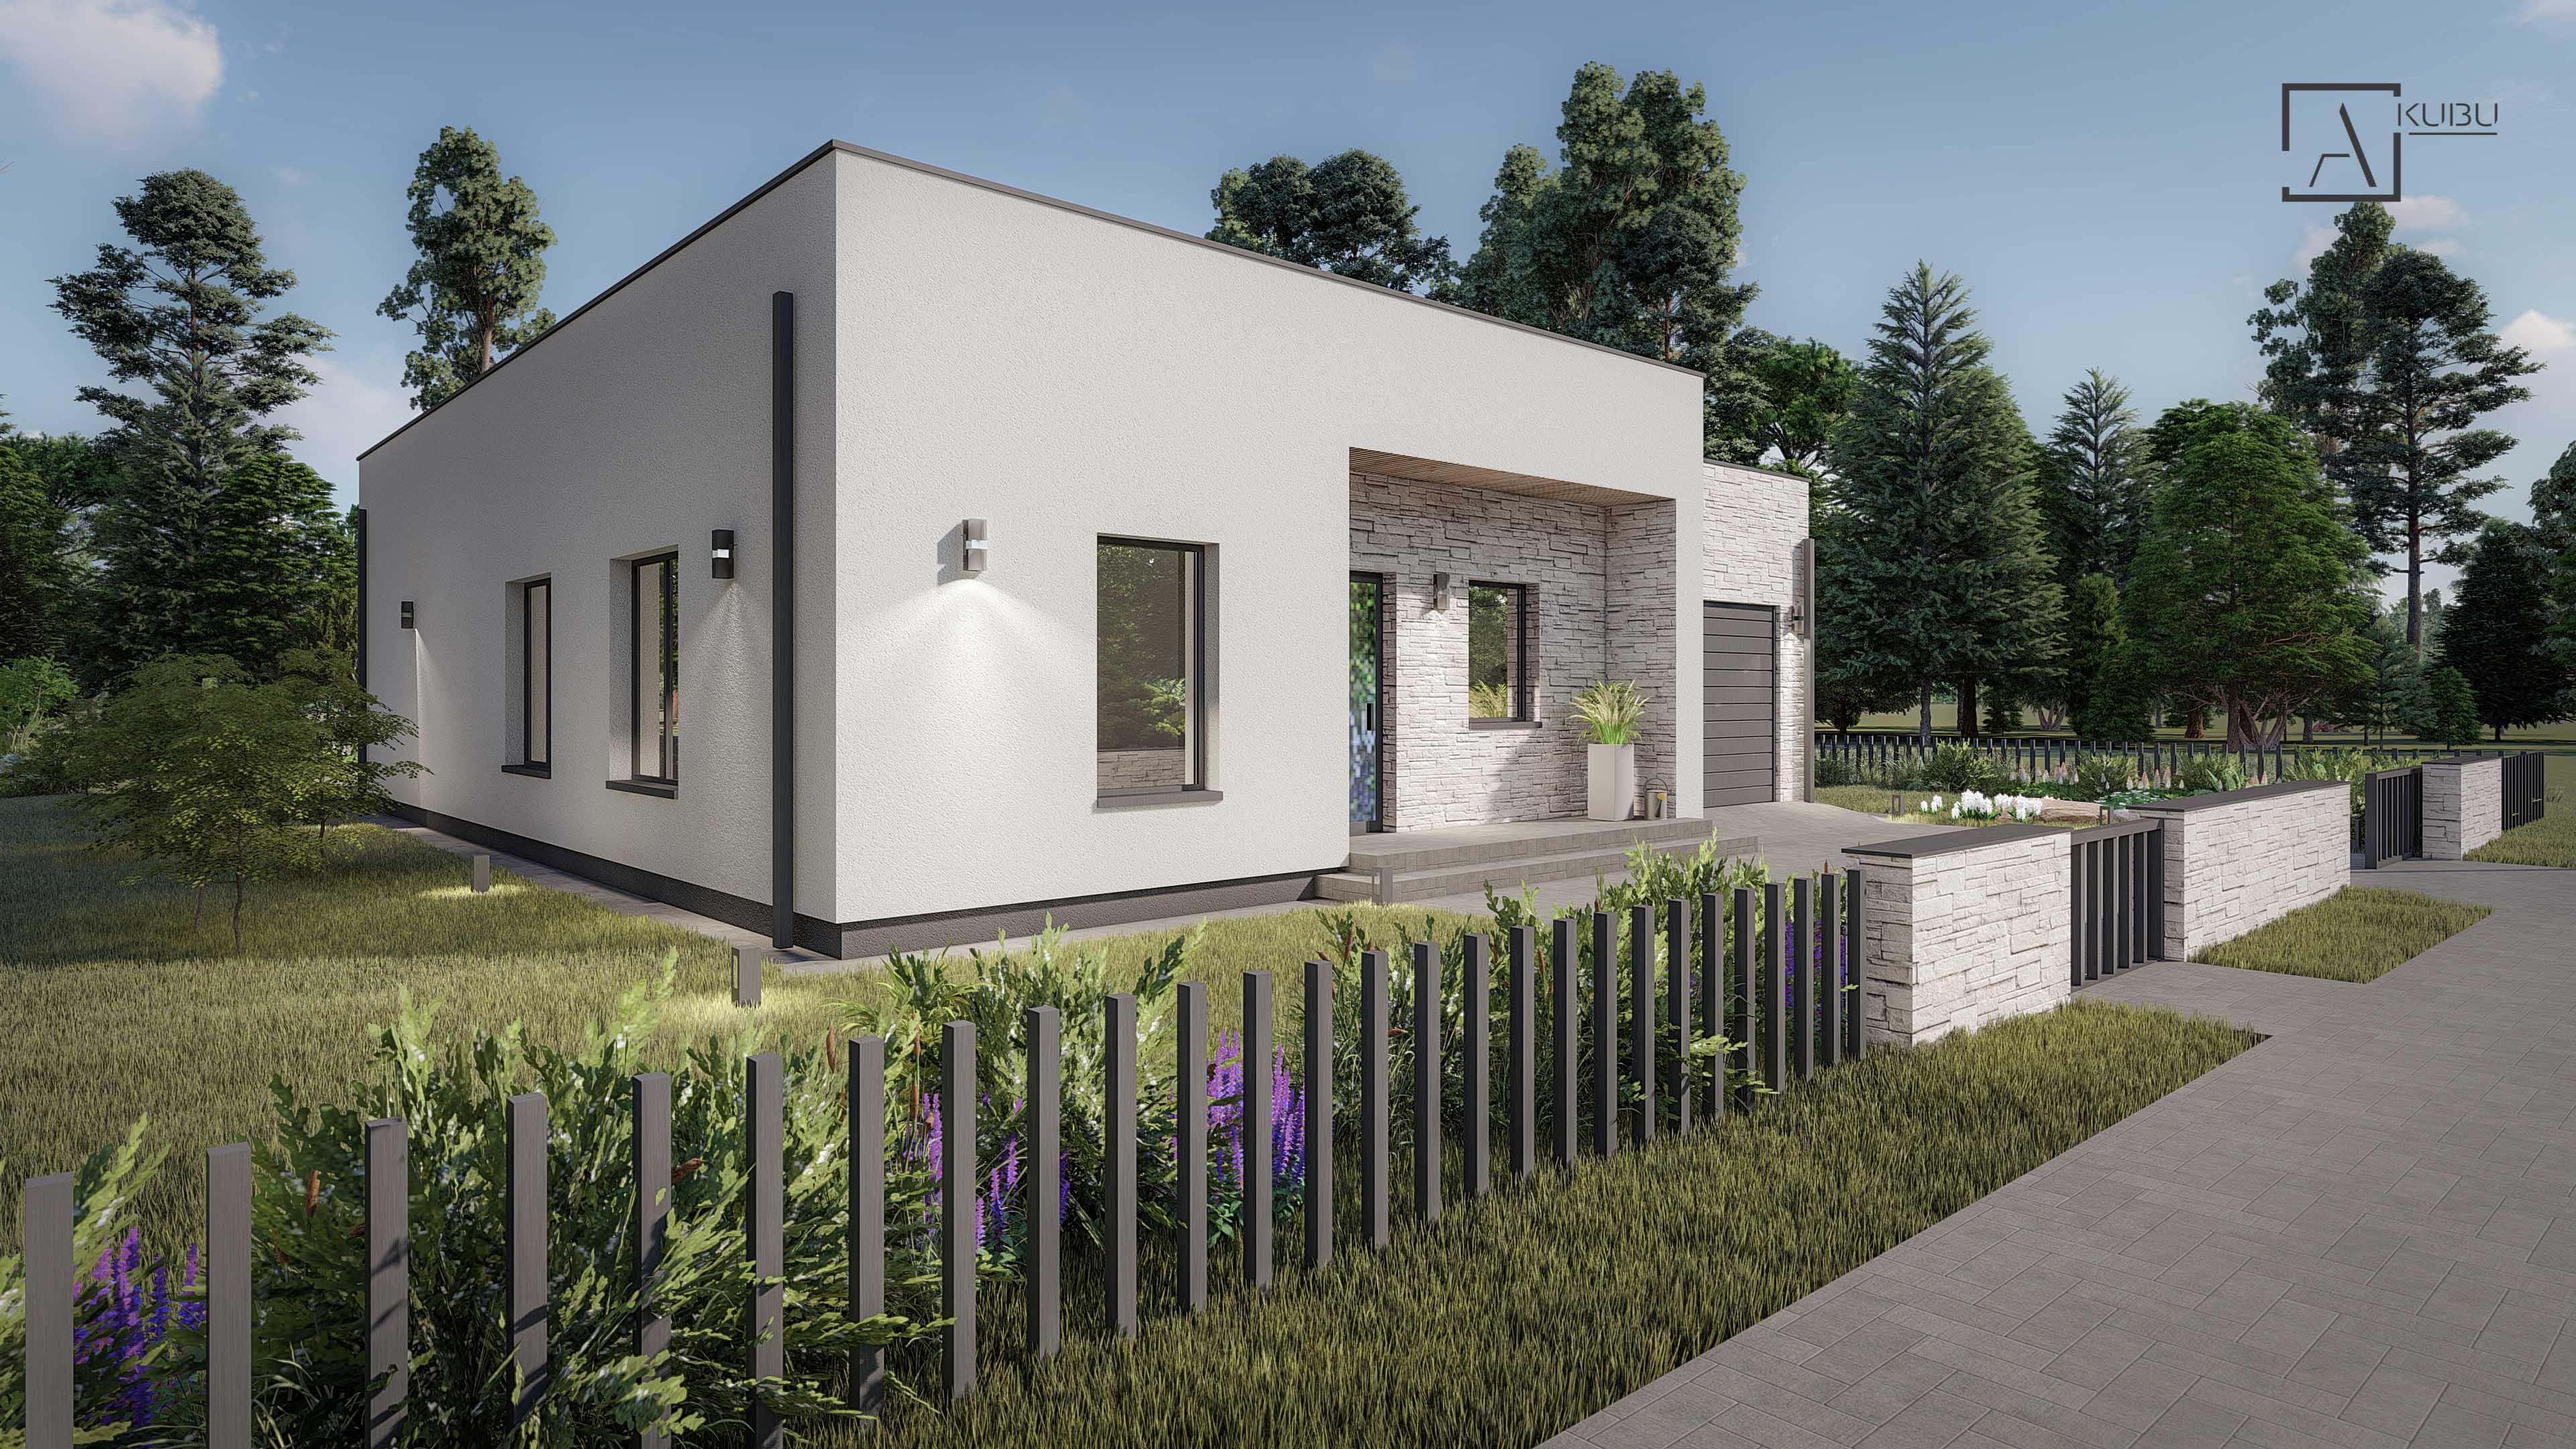 Modernus A KUBU namas